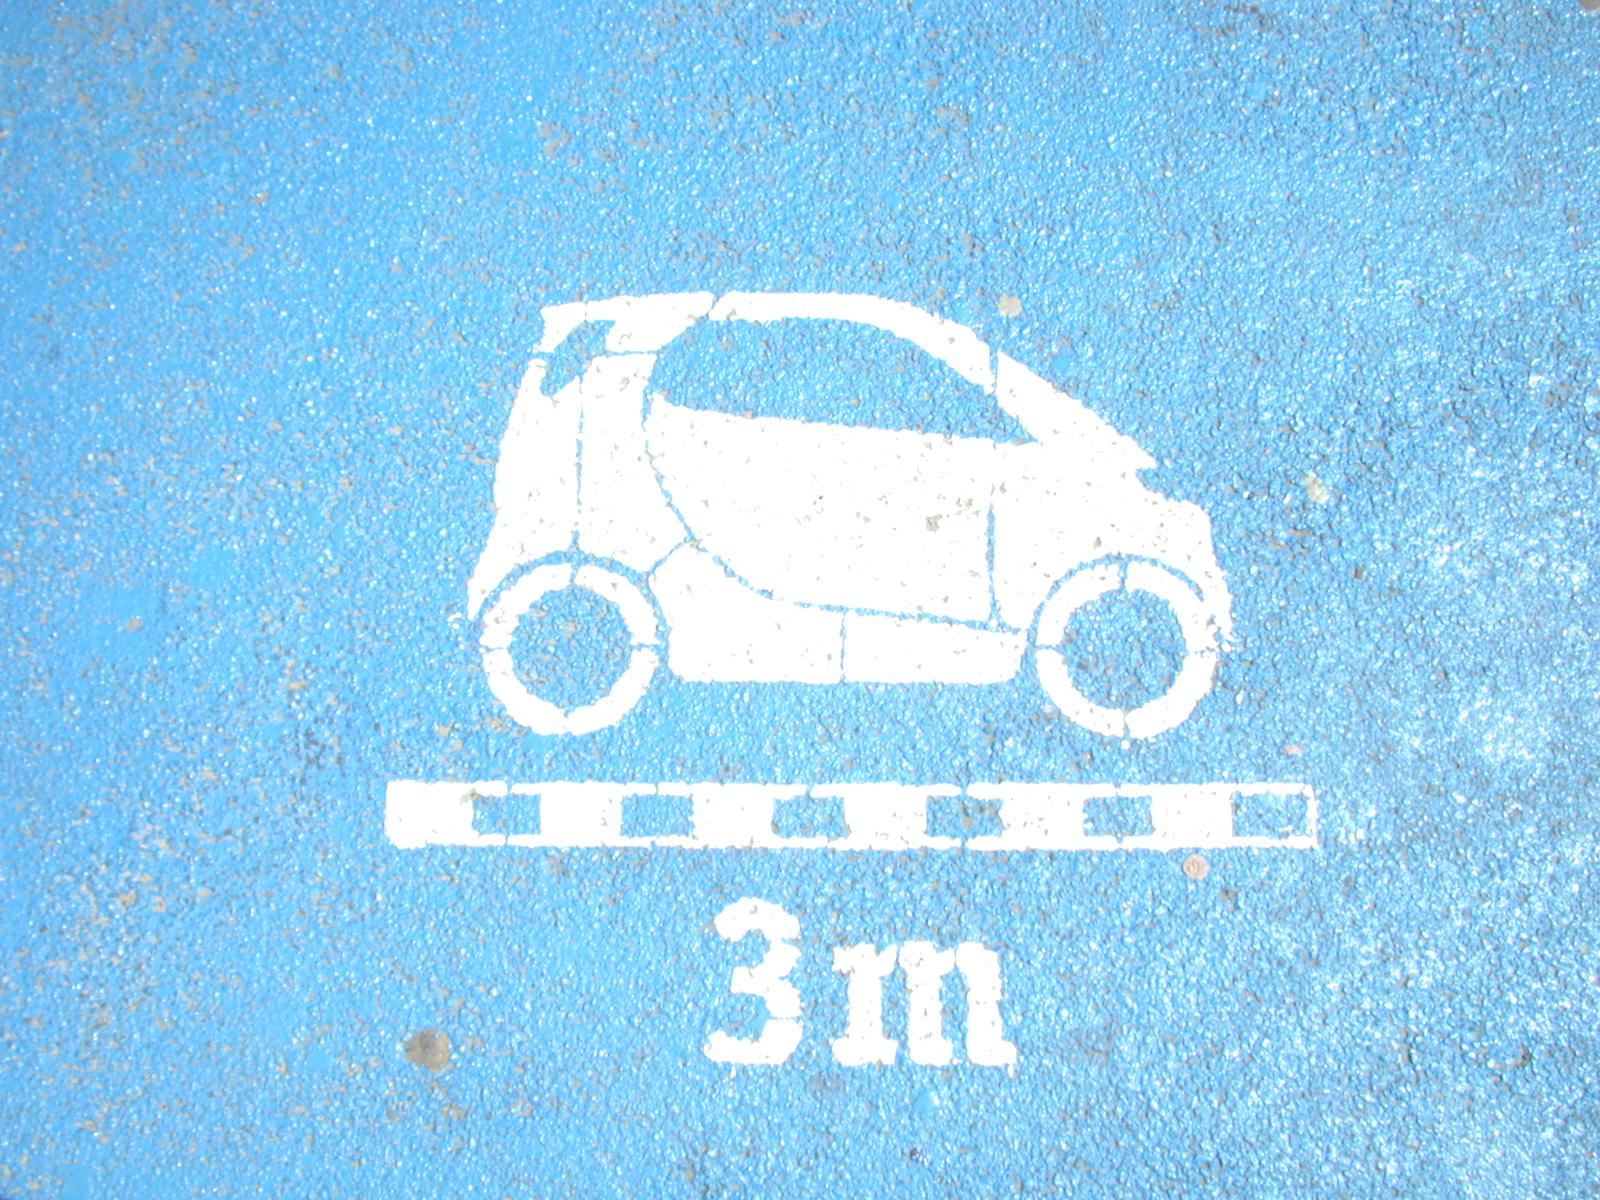 small car parking space blue 3 meter smart logo illustration